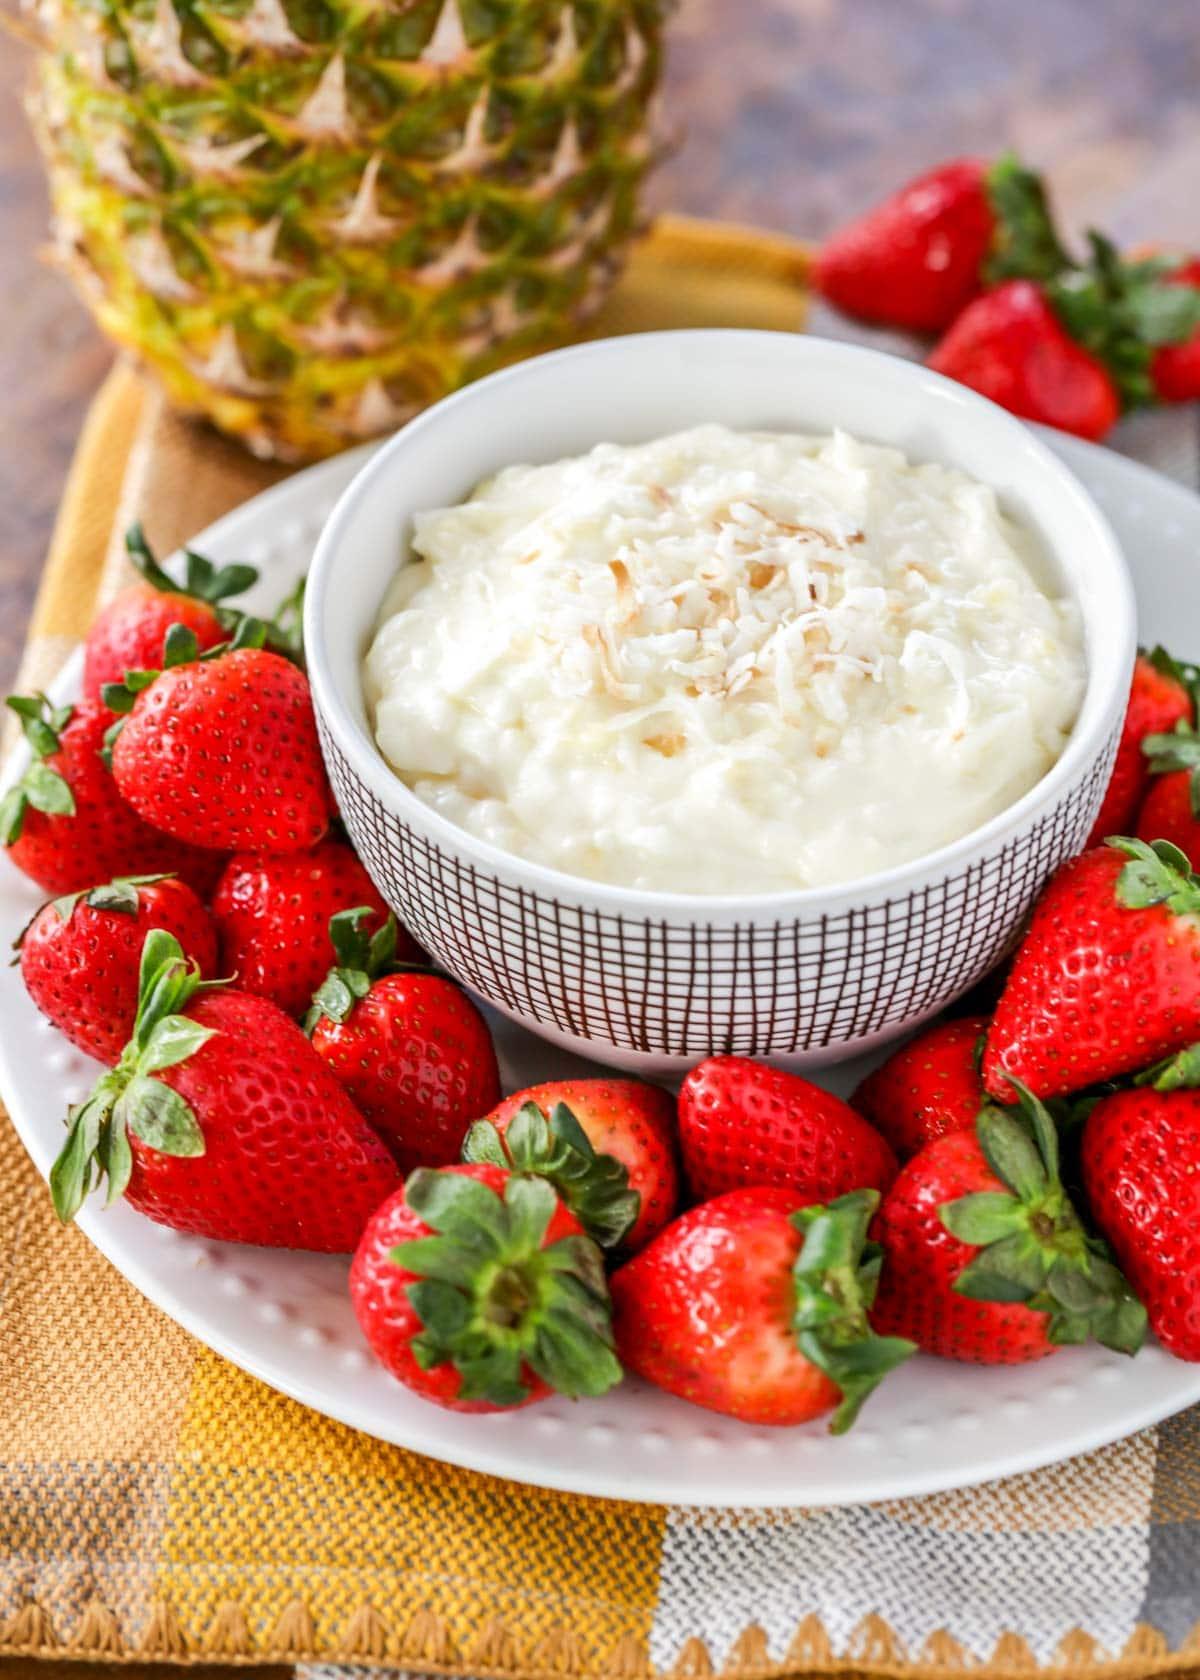 Pina colada fruit dip recipe in a white bowl